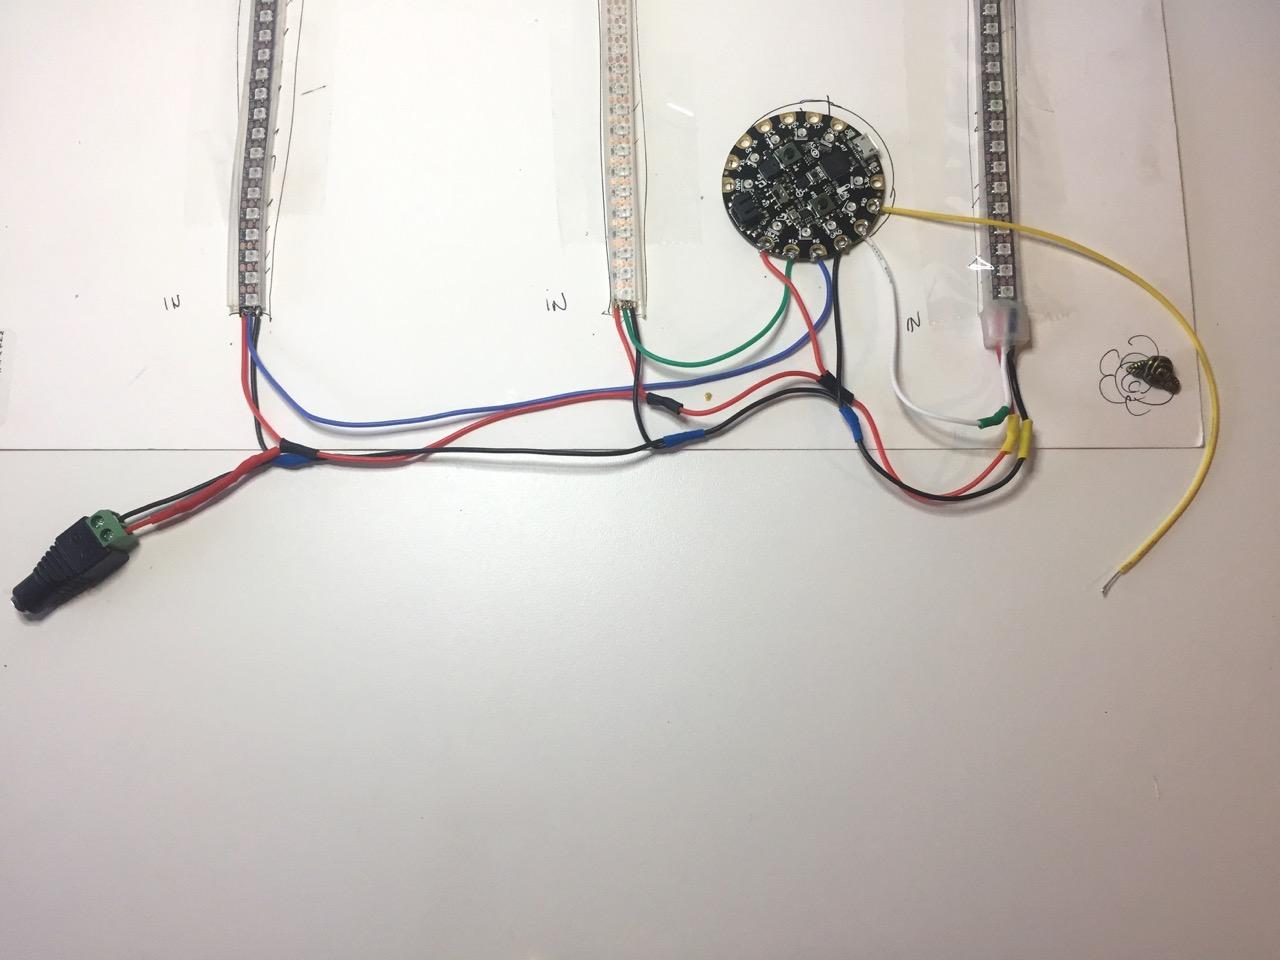 led_strips_14_captouchwire.jpg